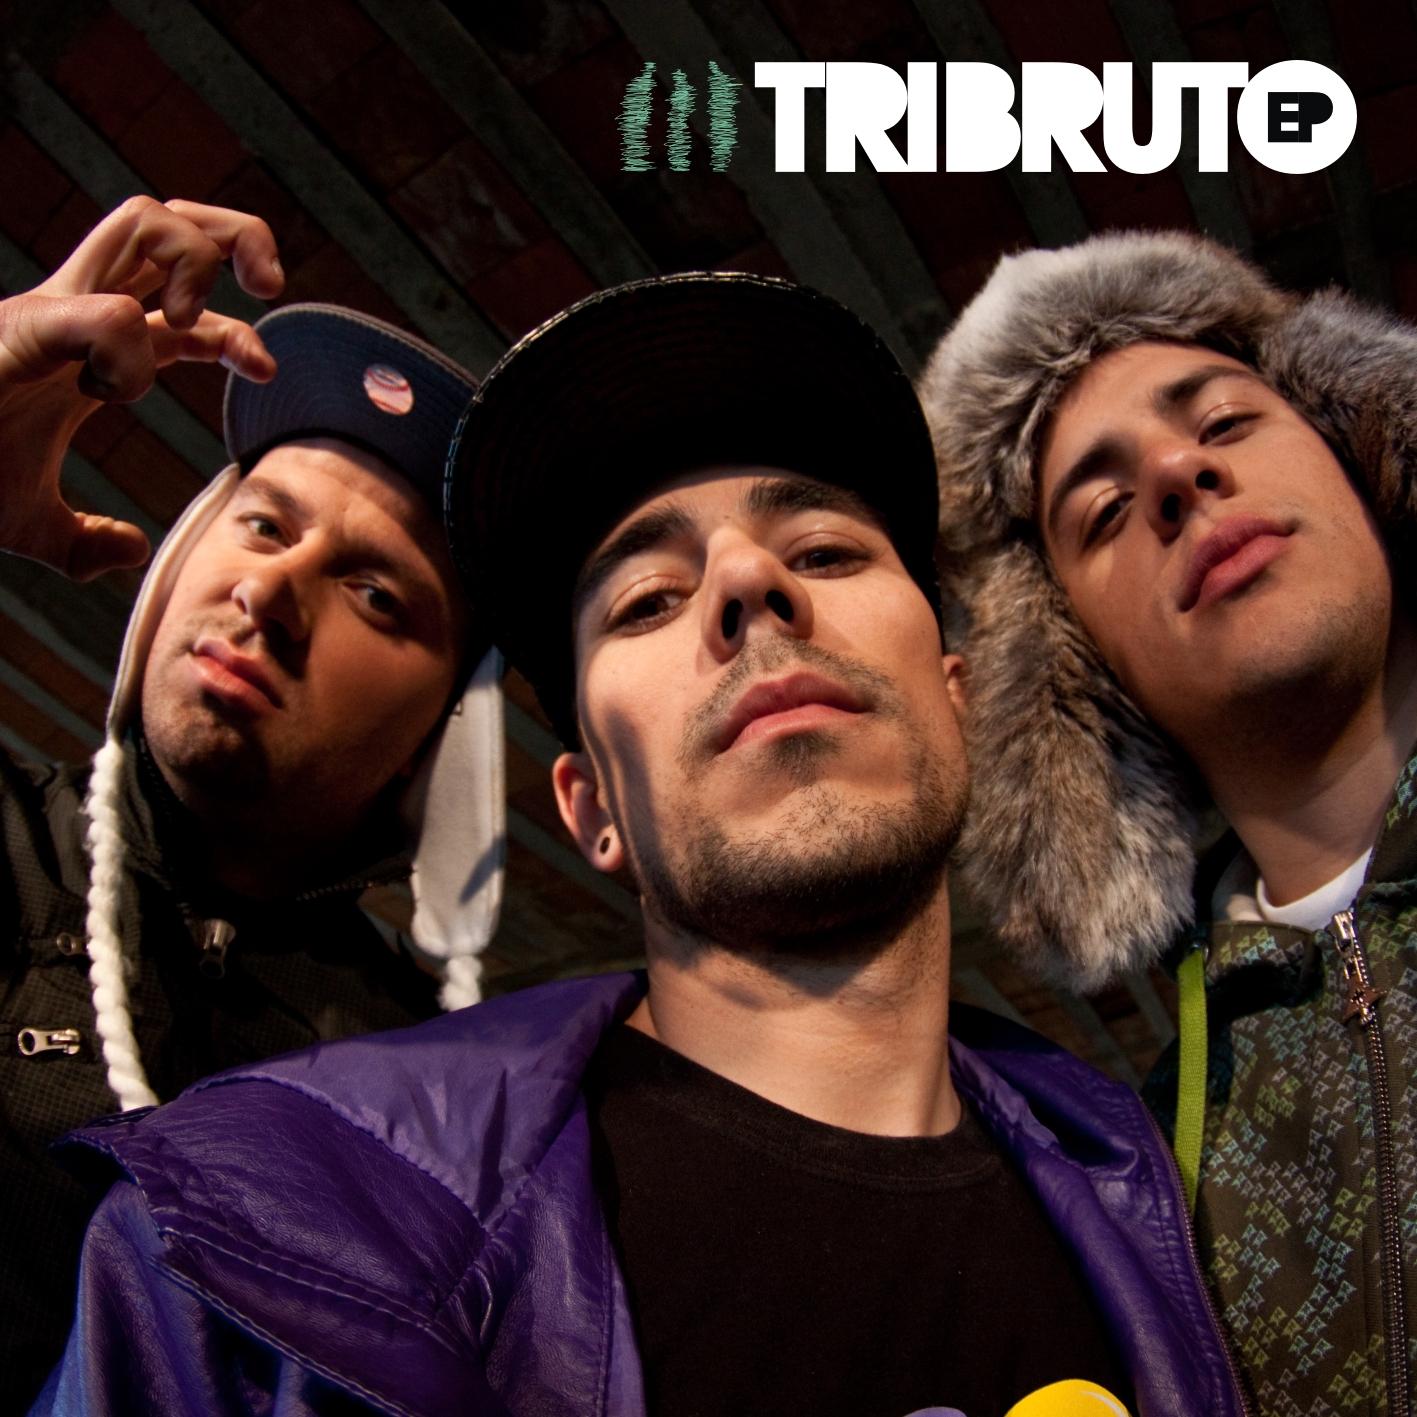 Tribruto - EP